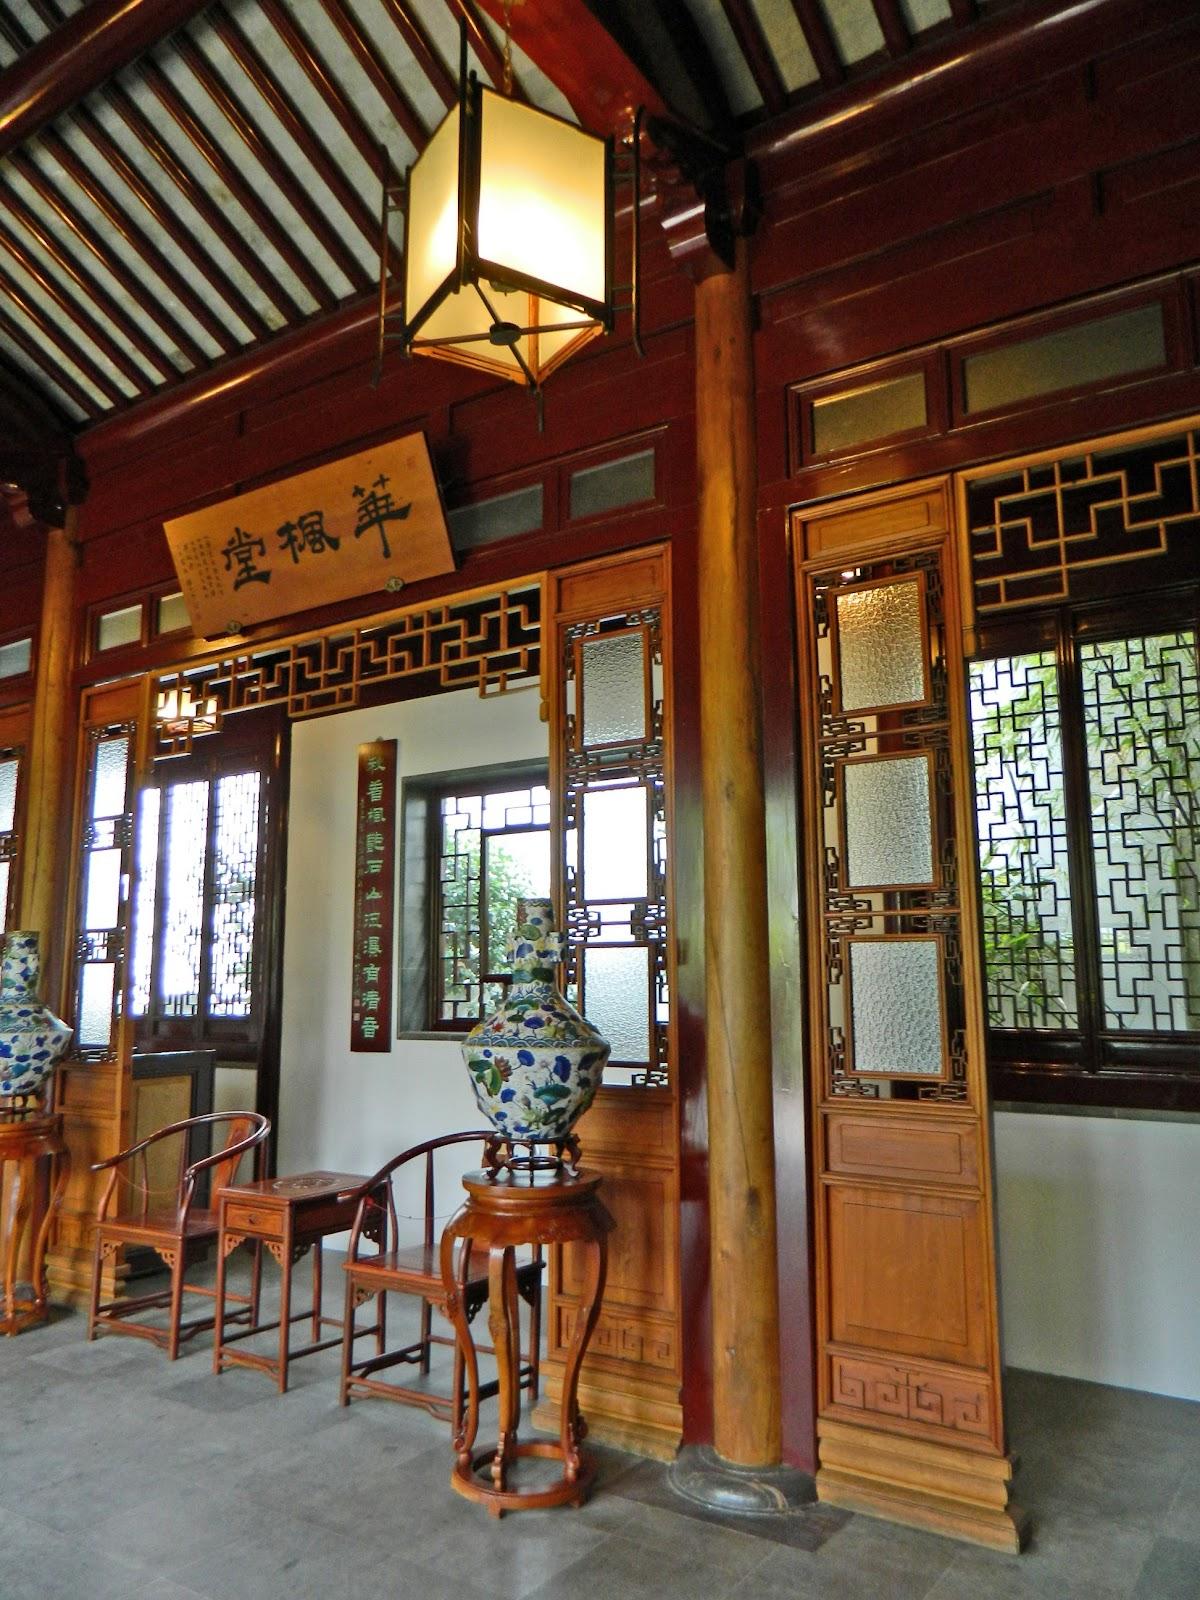 Jax Stumpes: 2015 Canada West: Sun Yat Sen Garden (6/25/2015)